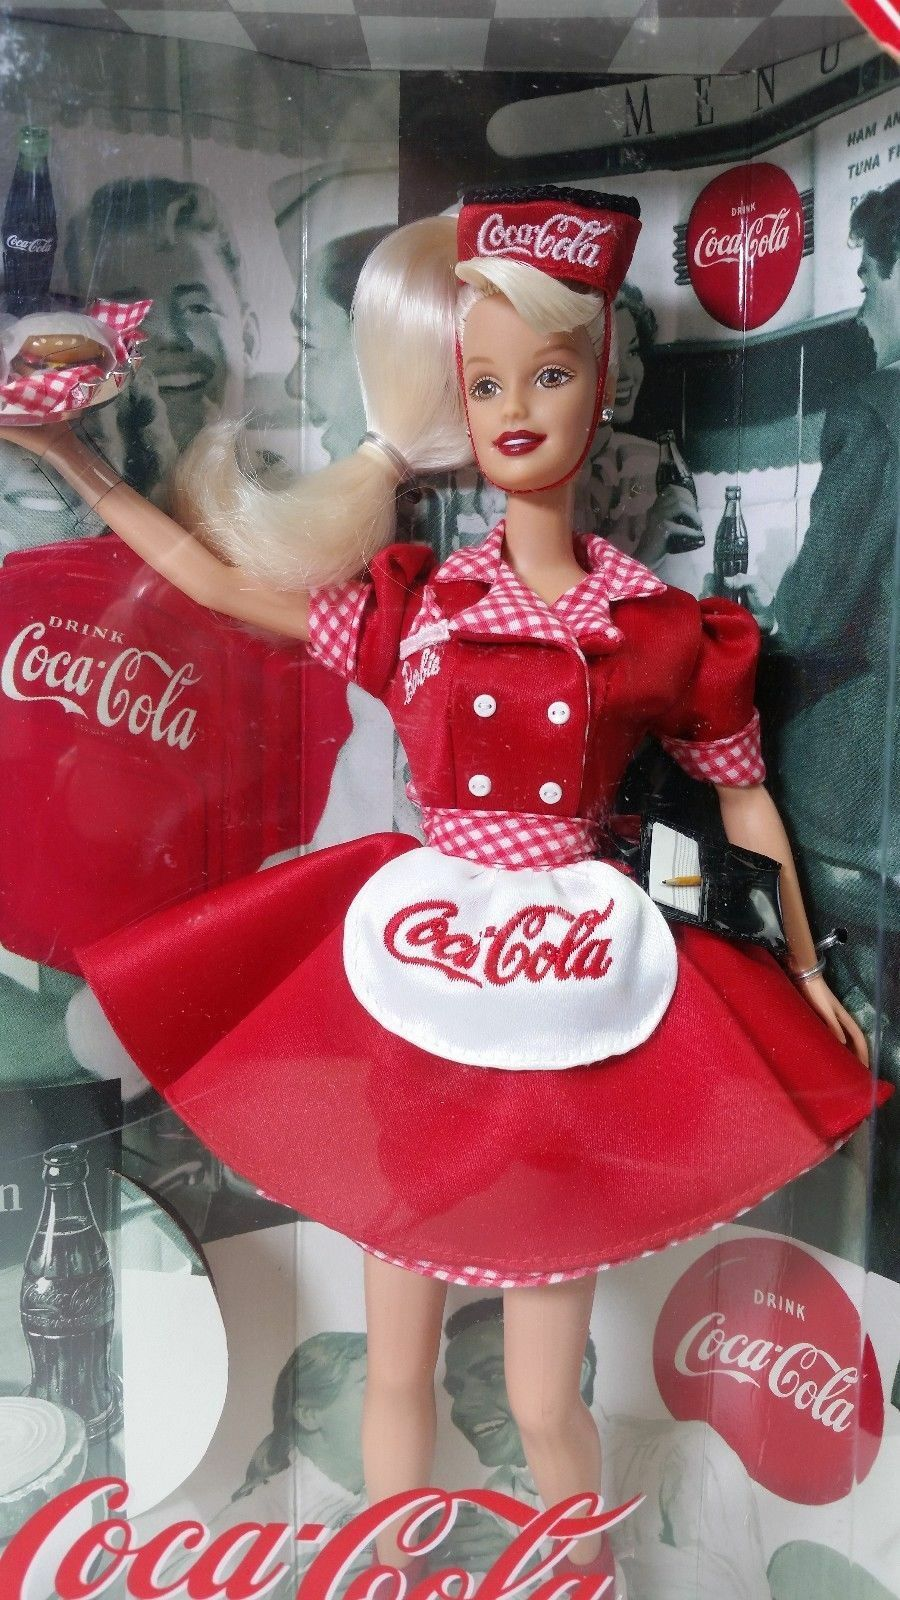 @-BARBIE COCA COLA RAR SELTEN SODA FOUNTAIN WAITRESS VINTAGE PUPPE MAJORETTE